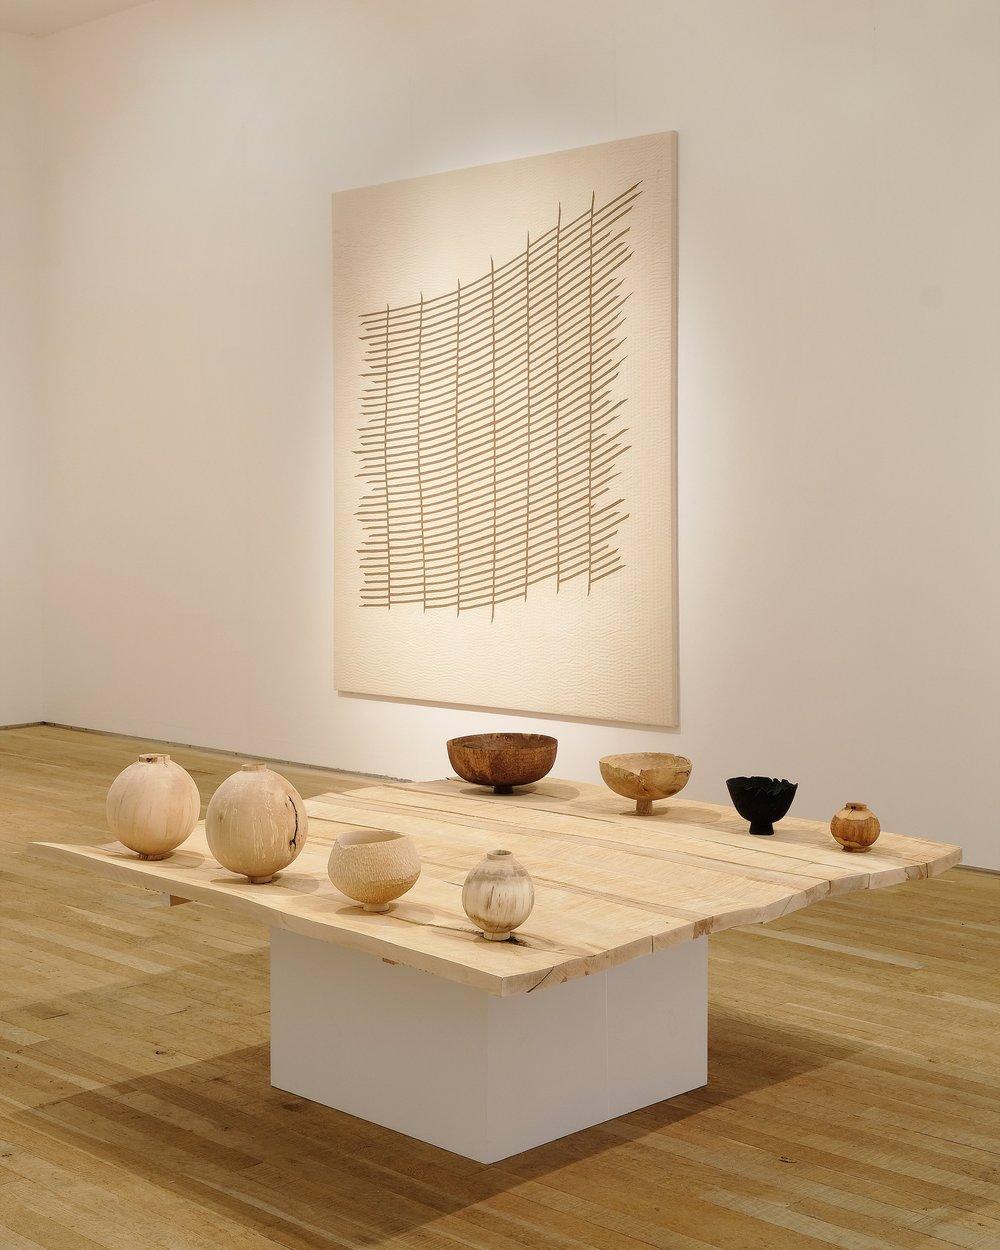 Abigail Booth | Max Bainbridge | Artists | Wood Vessels | Textile Art